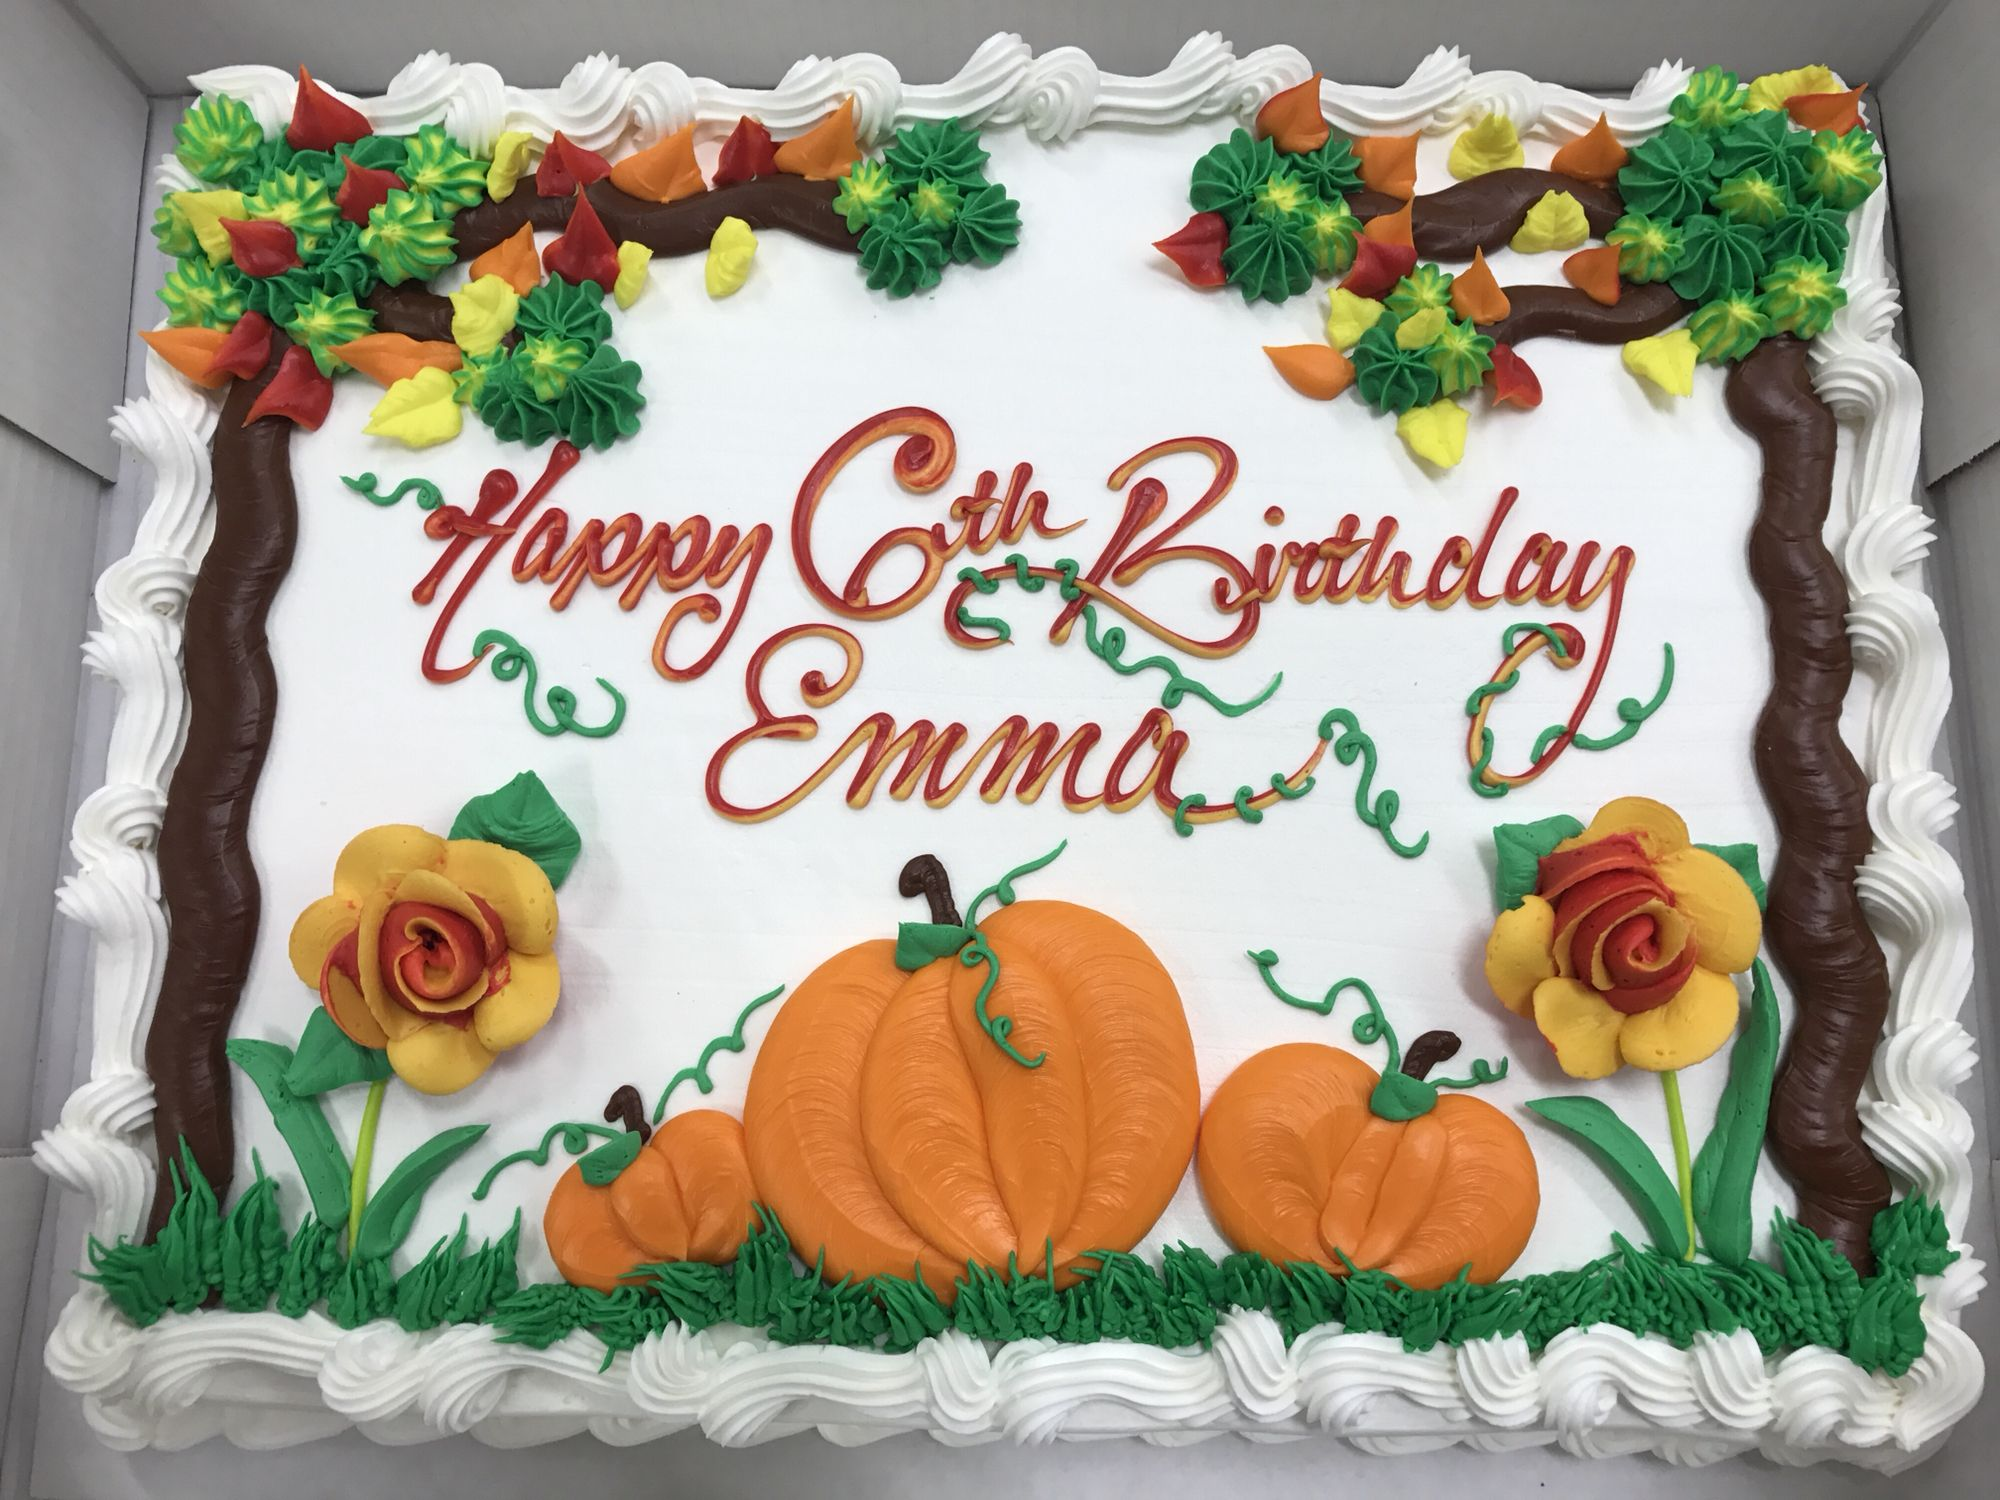 Fantastic Pumpkin Patch Cake Birthday Sheet Cakes Pumpkin Birthday Cakes Funny Birthday Cards Online Alyptdamsfinfo